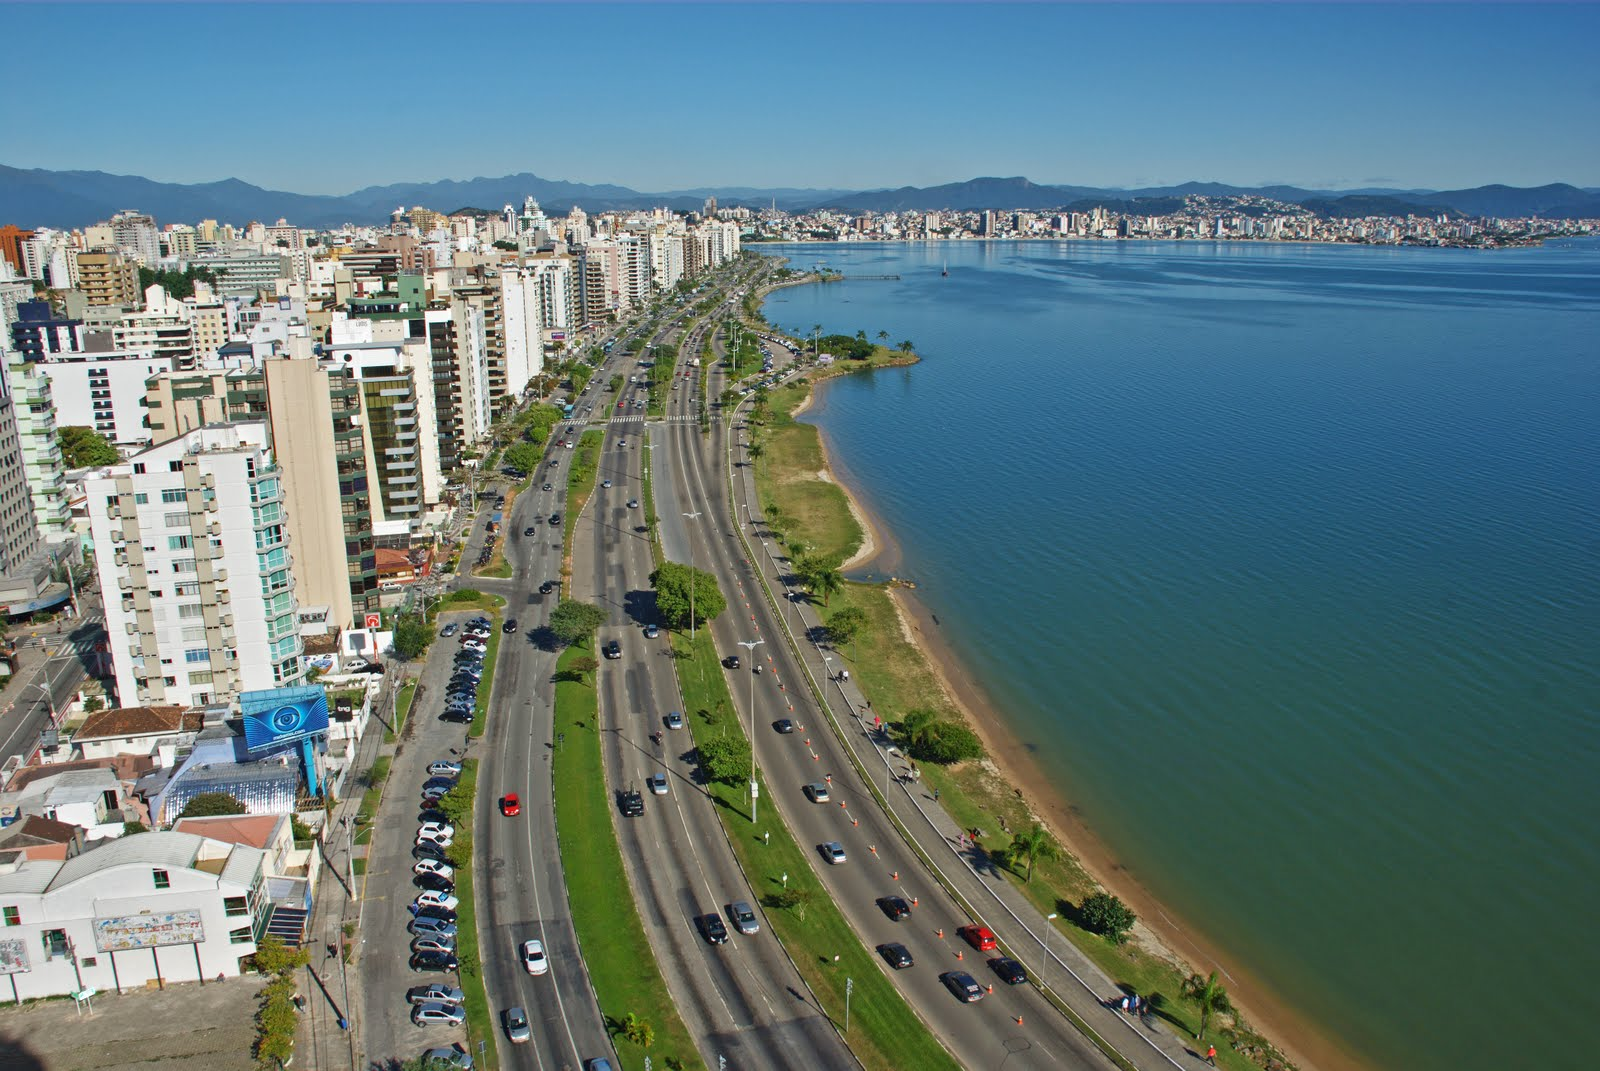 Resultado de imagen para florianopolis santa catarina, brasil